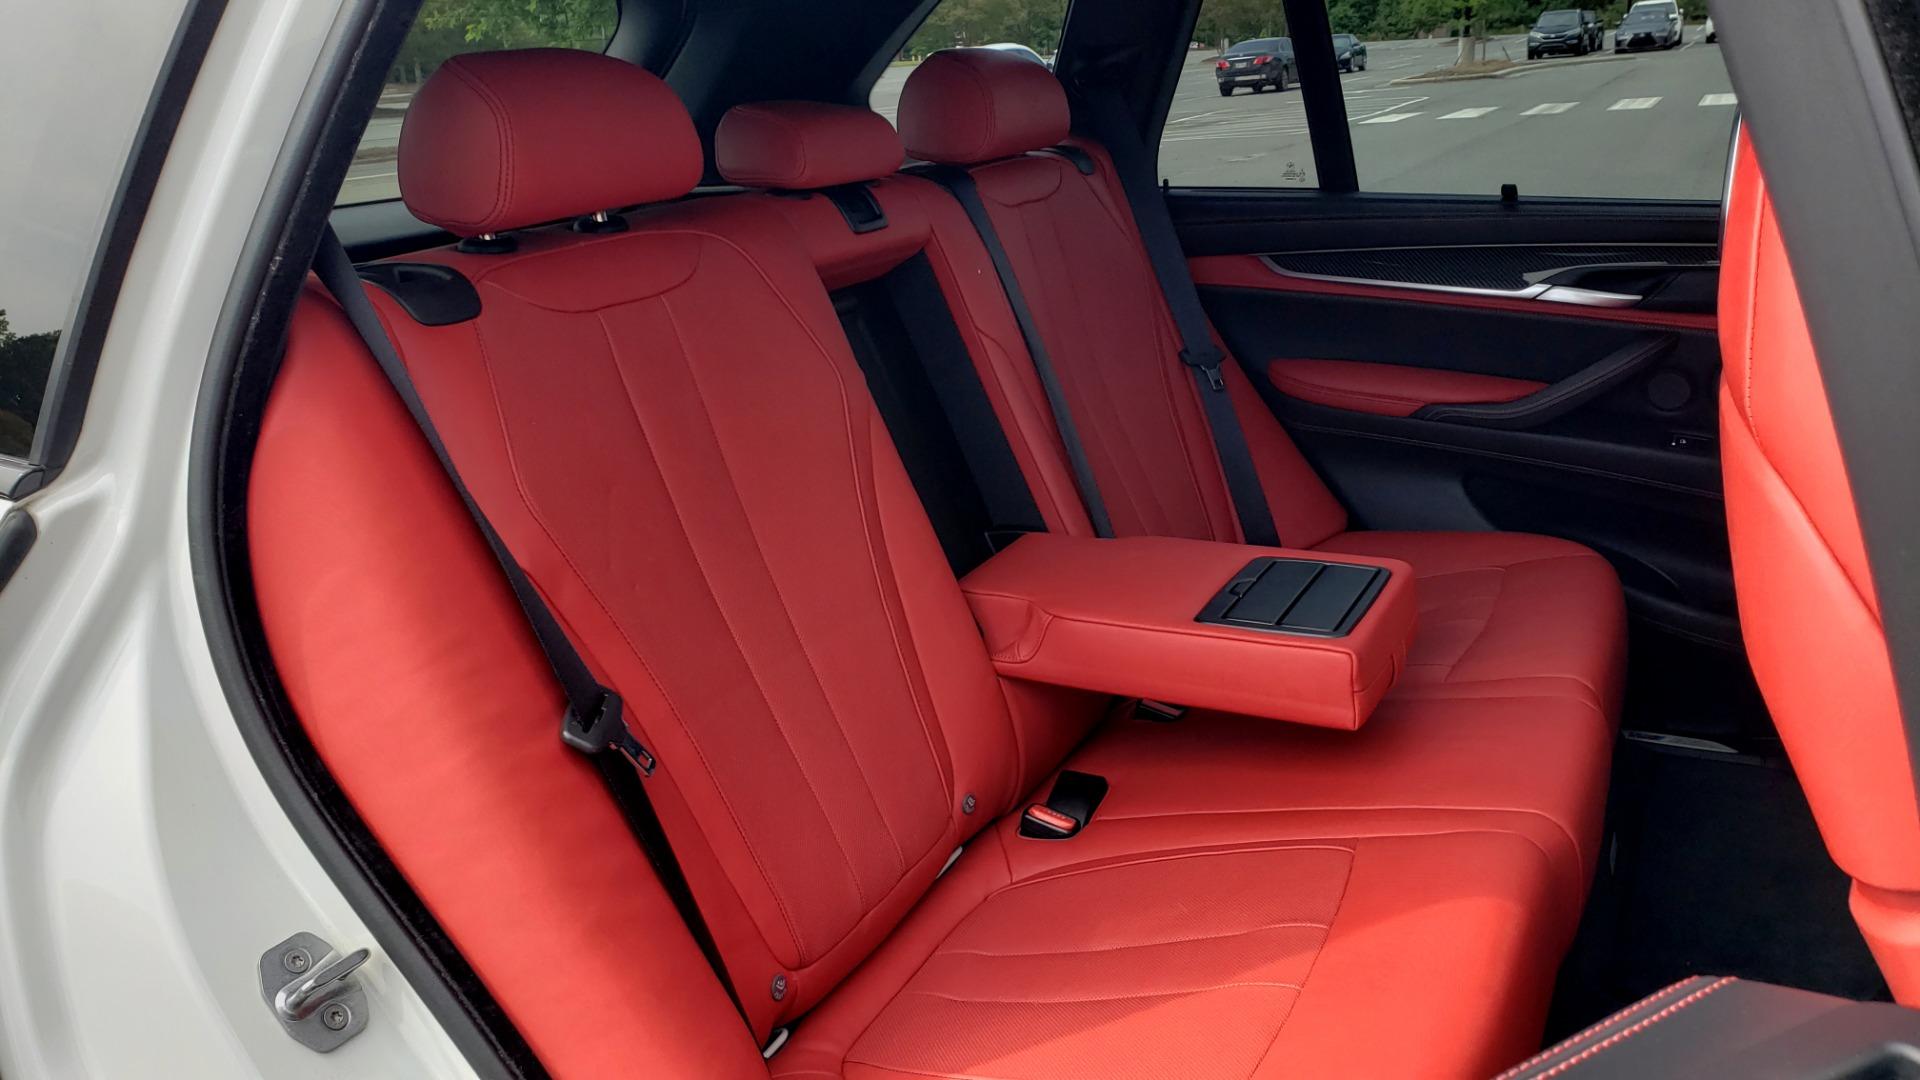 Used 2017 BMW X5 M EXECUTIVE PKG / NAV / DRVR ASST / BSM / HUD / HTD STS / WIFI for sale Sold at Formula Imports in Charlotte NC 28227 77